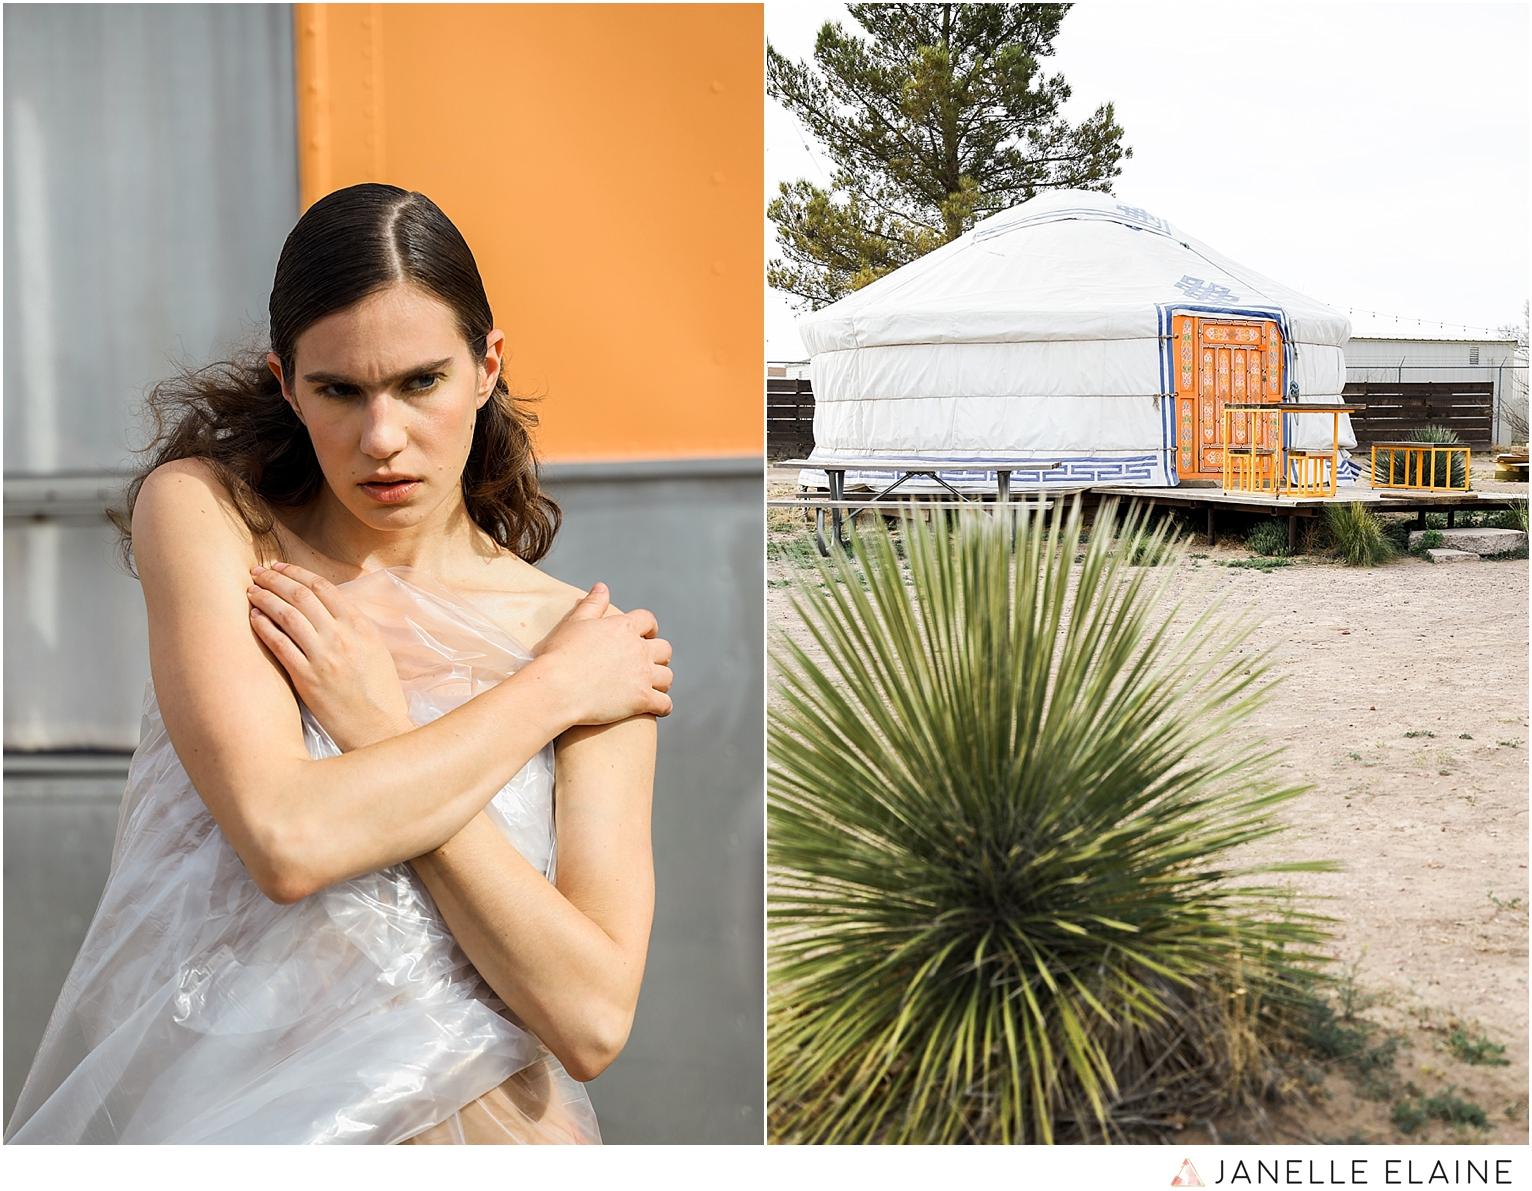 yeah field trip-marfa texas-el cosmico-bare essentials-workshop-nude-portrait-photographer-seattle photographer janelle elaine-10.jpg